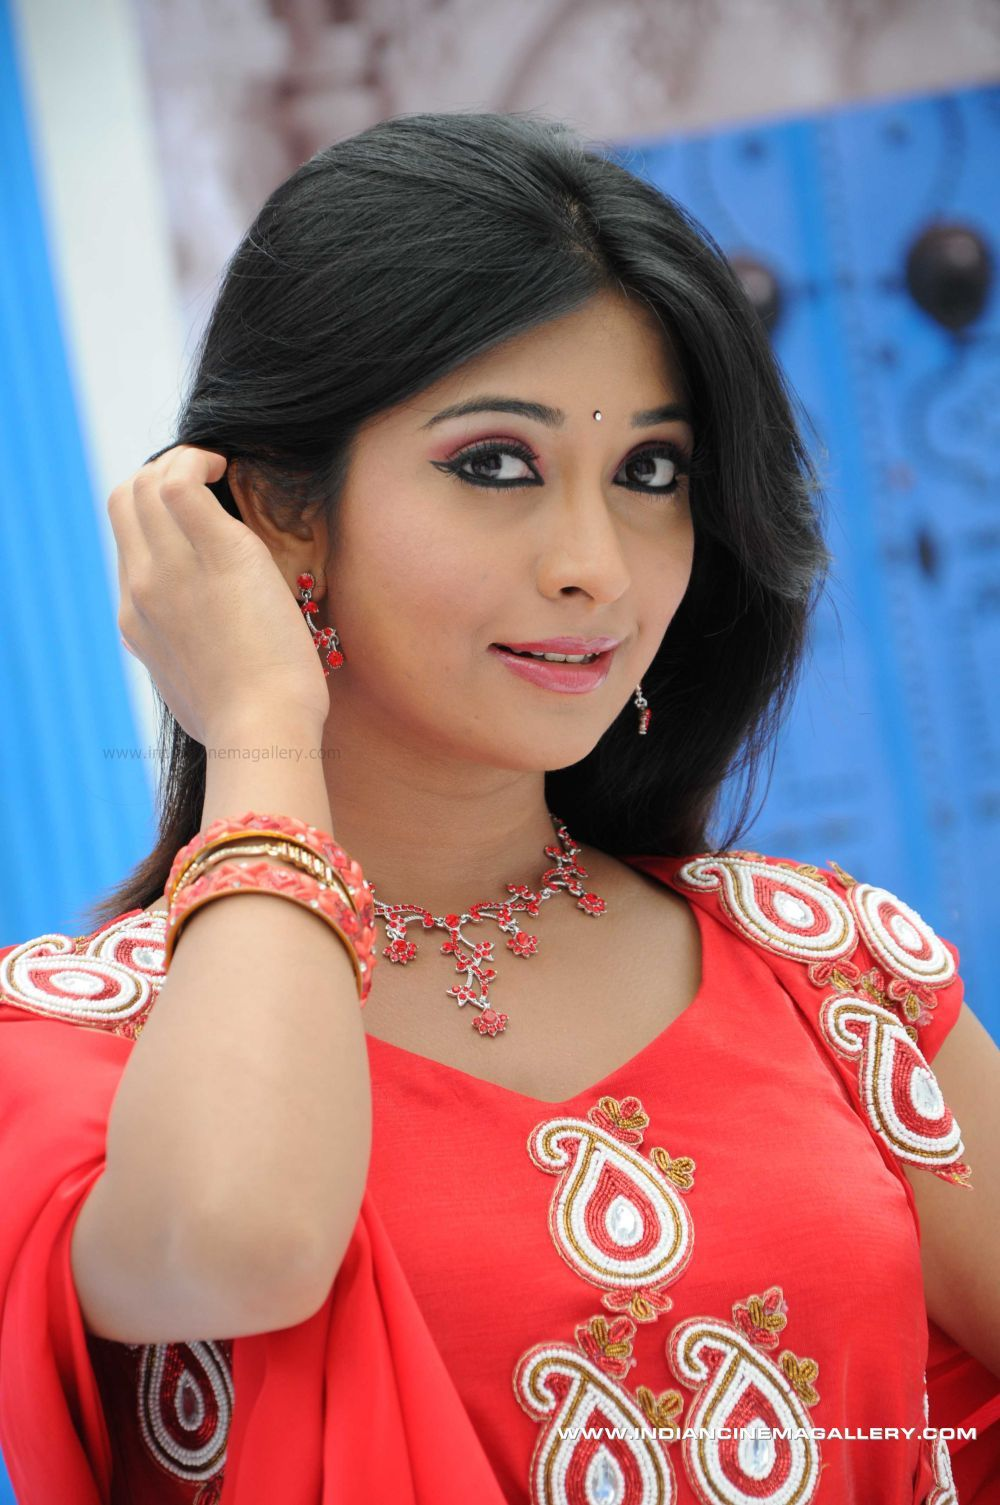 Radhika Pandit | Tollywood | Indian actresses, Indian film actress